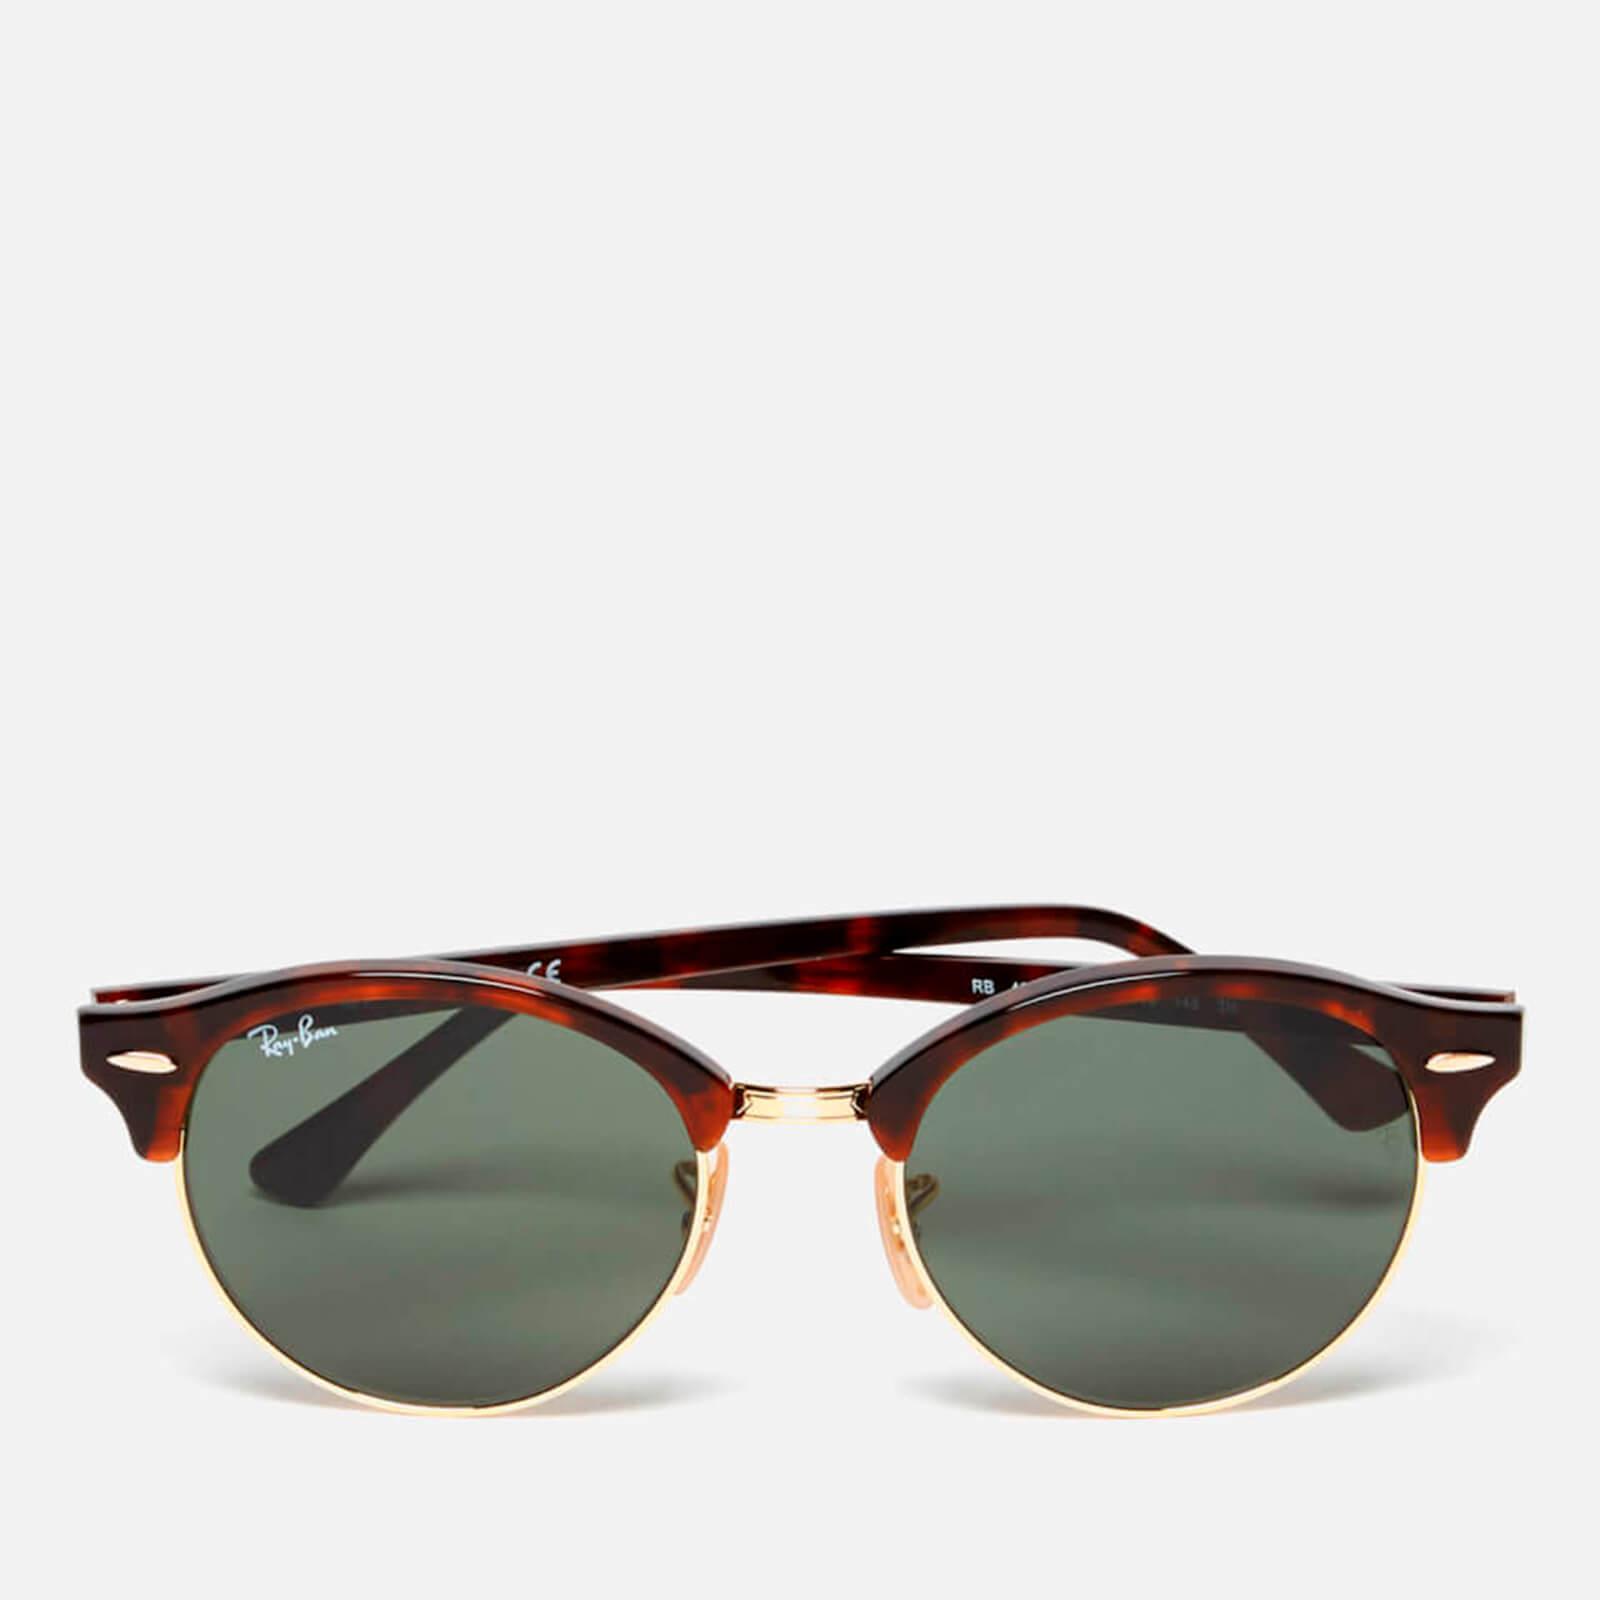 4b134d9d352d38 Ray-Ban Clubround Flat Lenses Half Metal Frame Sunglasses - Red Havana  Womens Accessories   TheHut.com